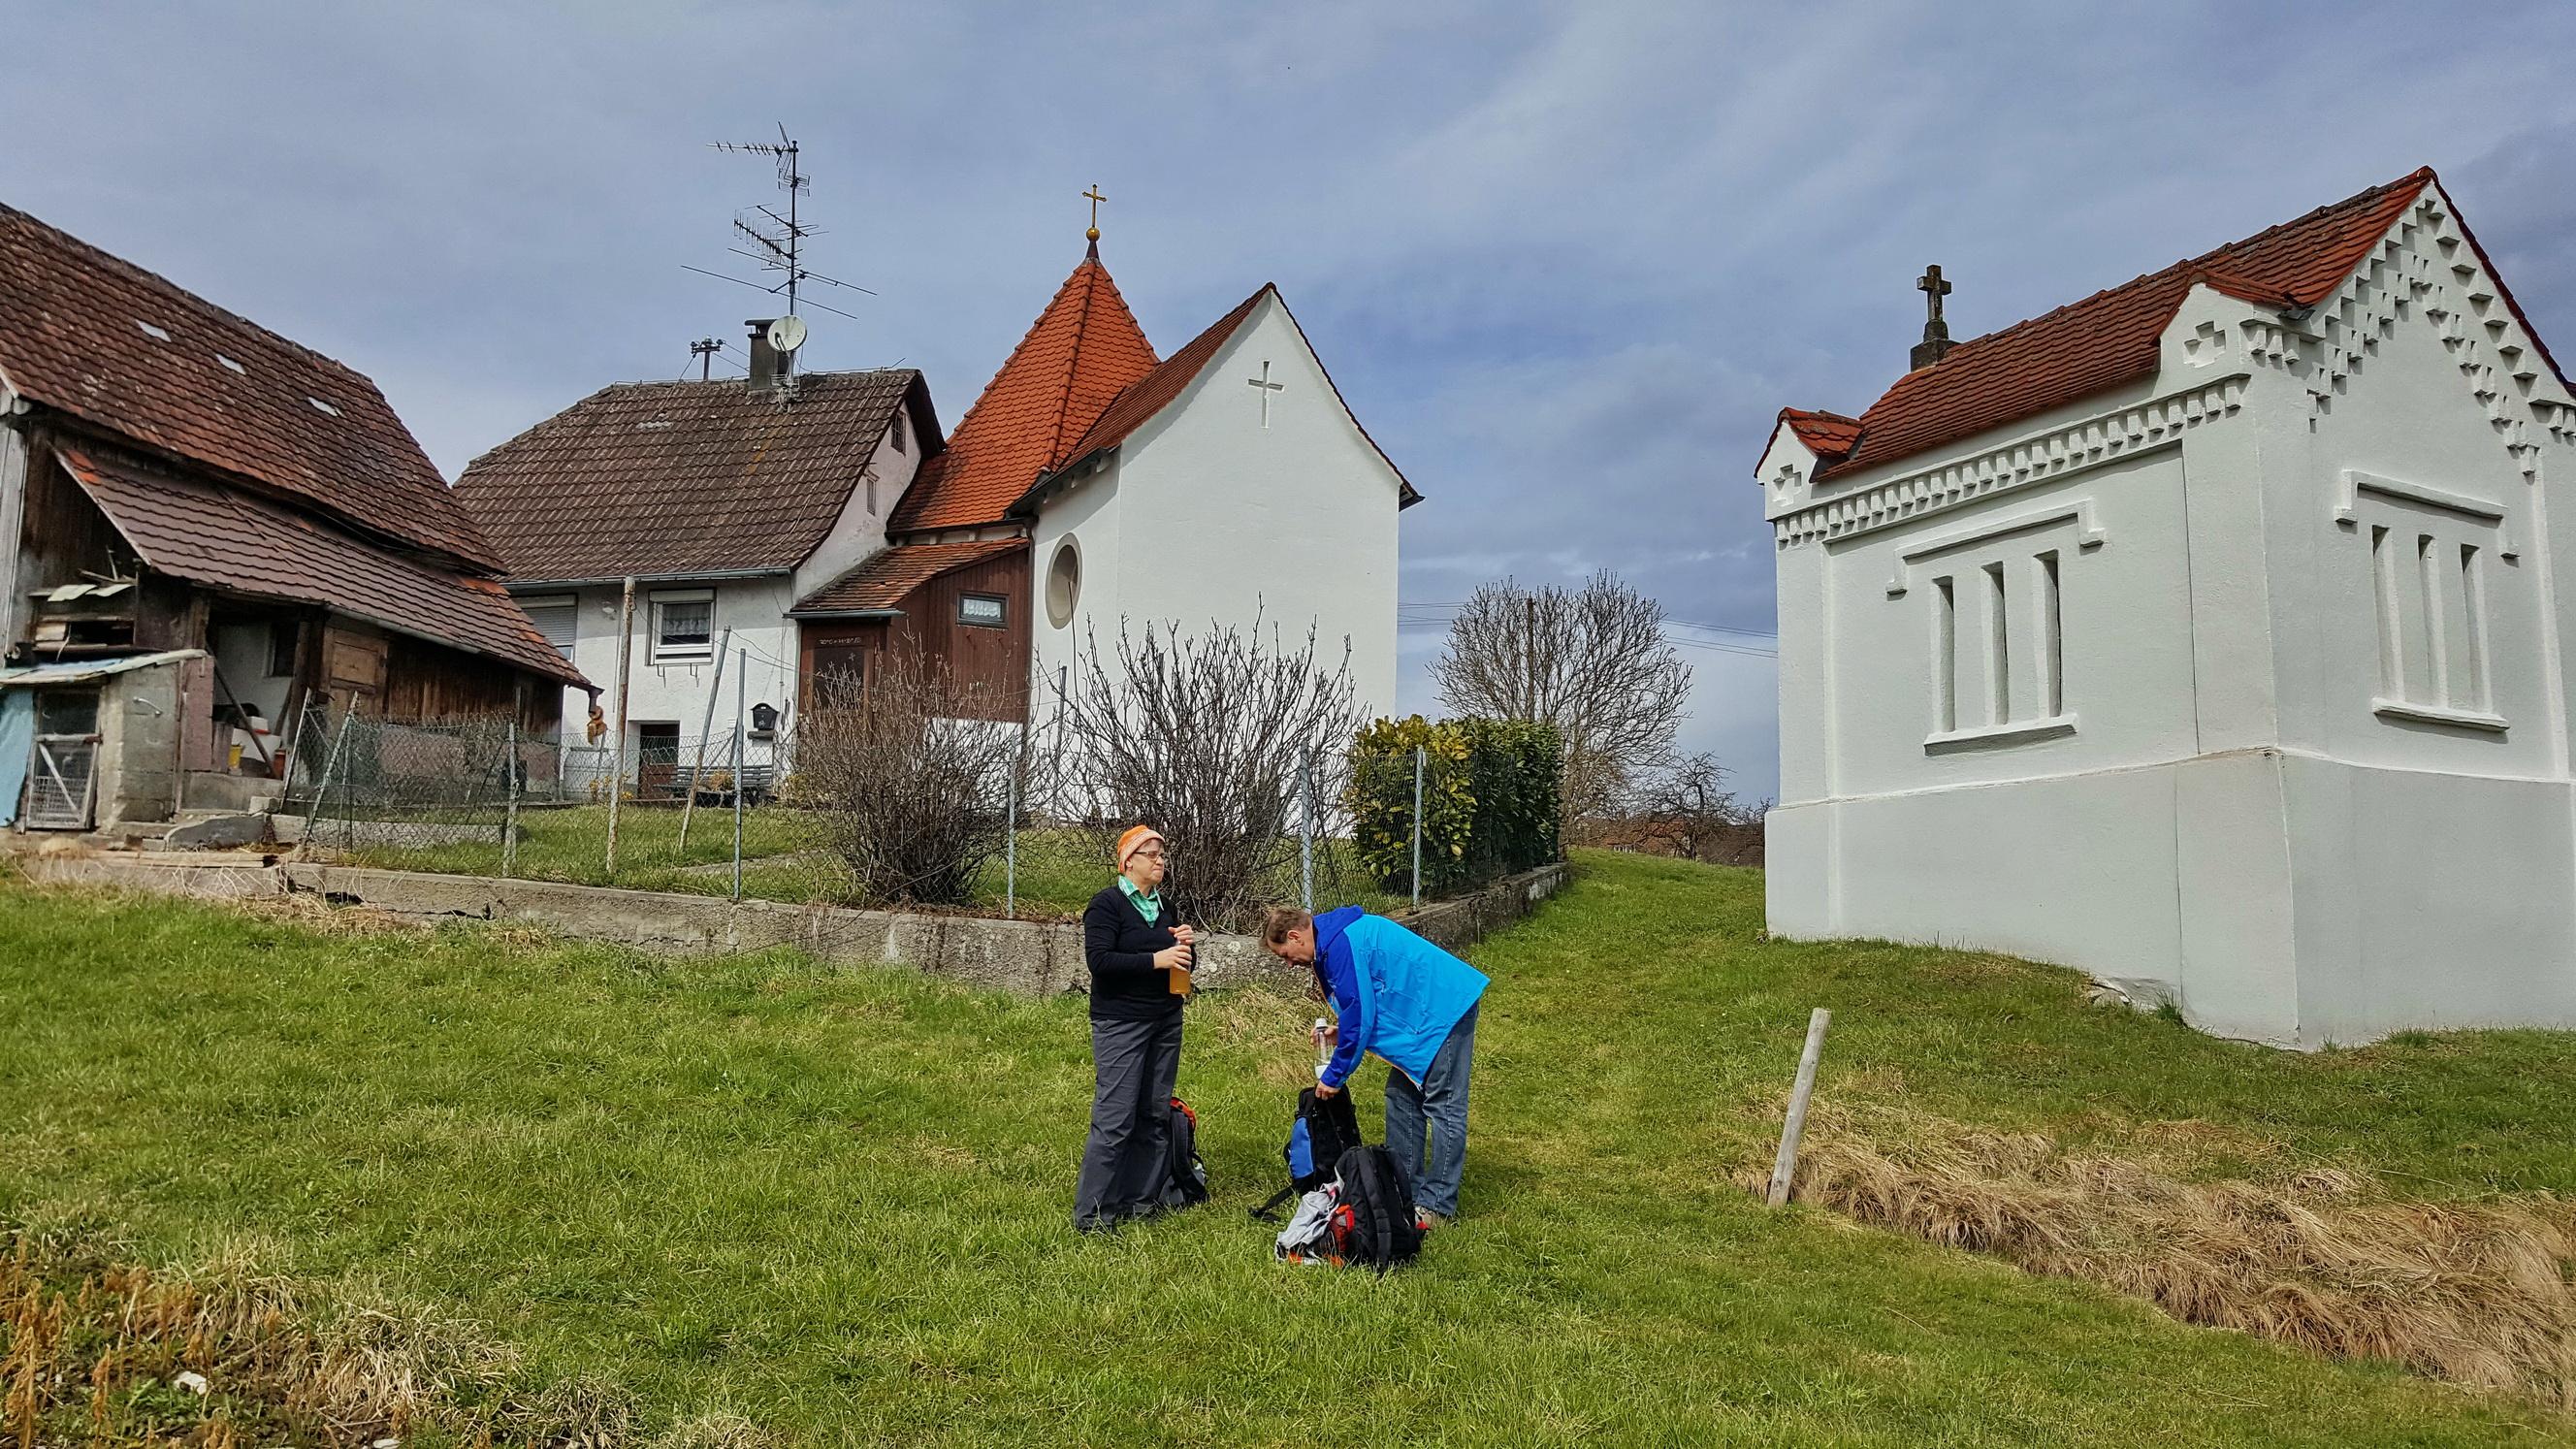 180330026_B_Gangolfkapelle